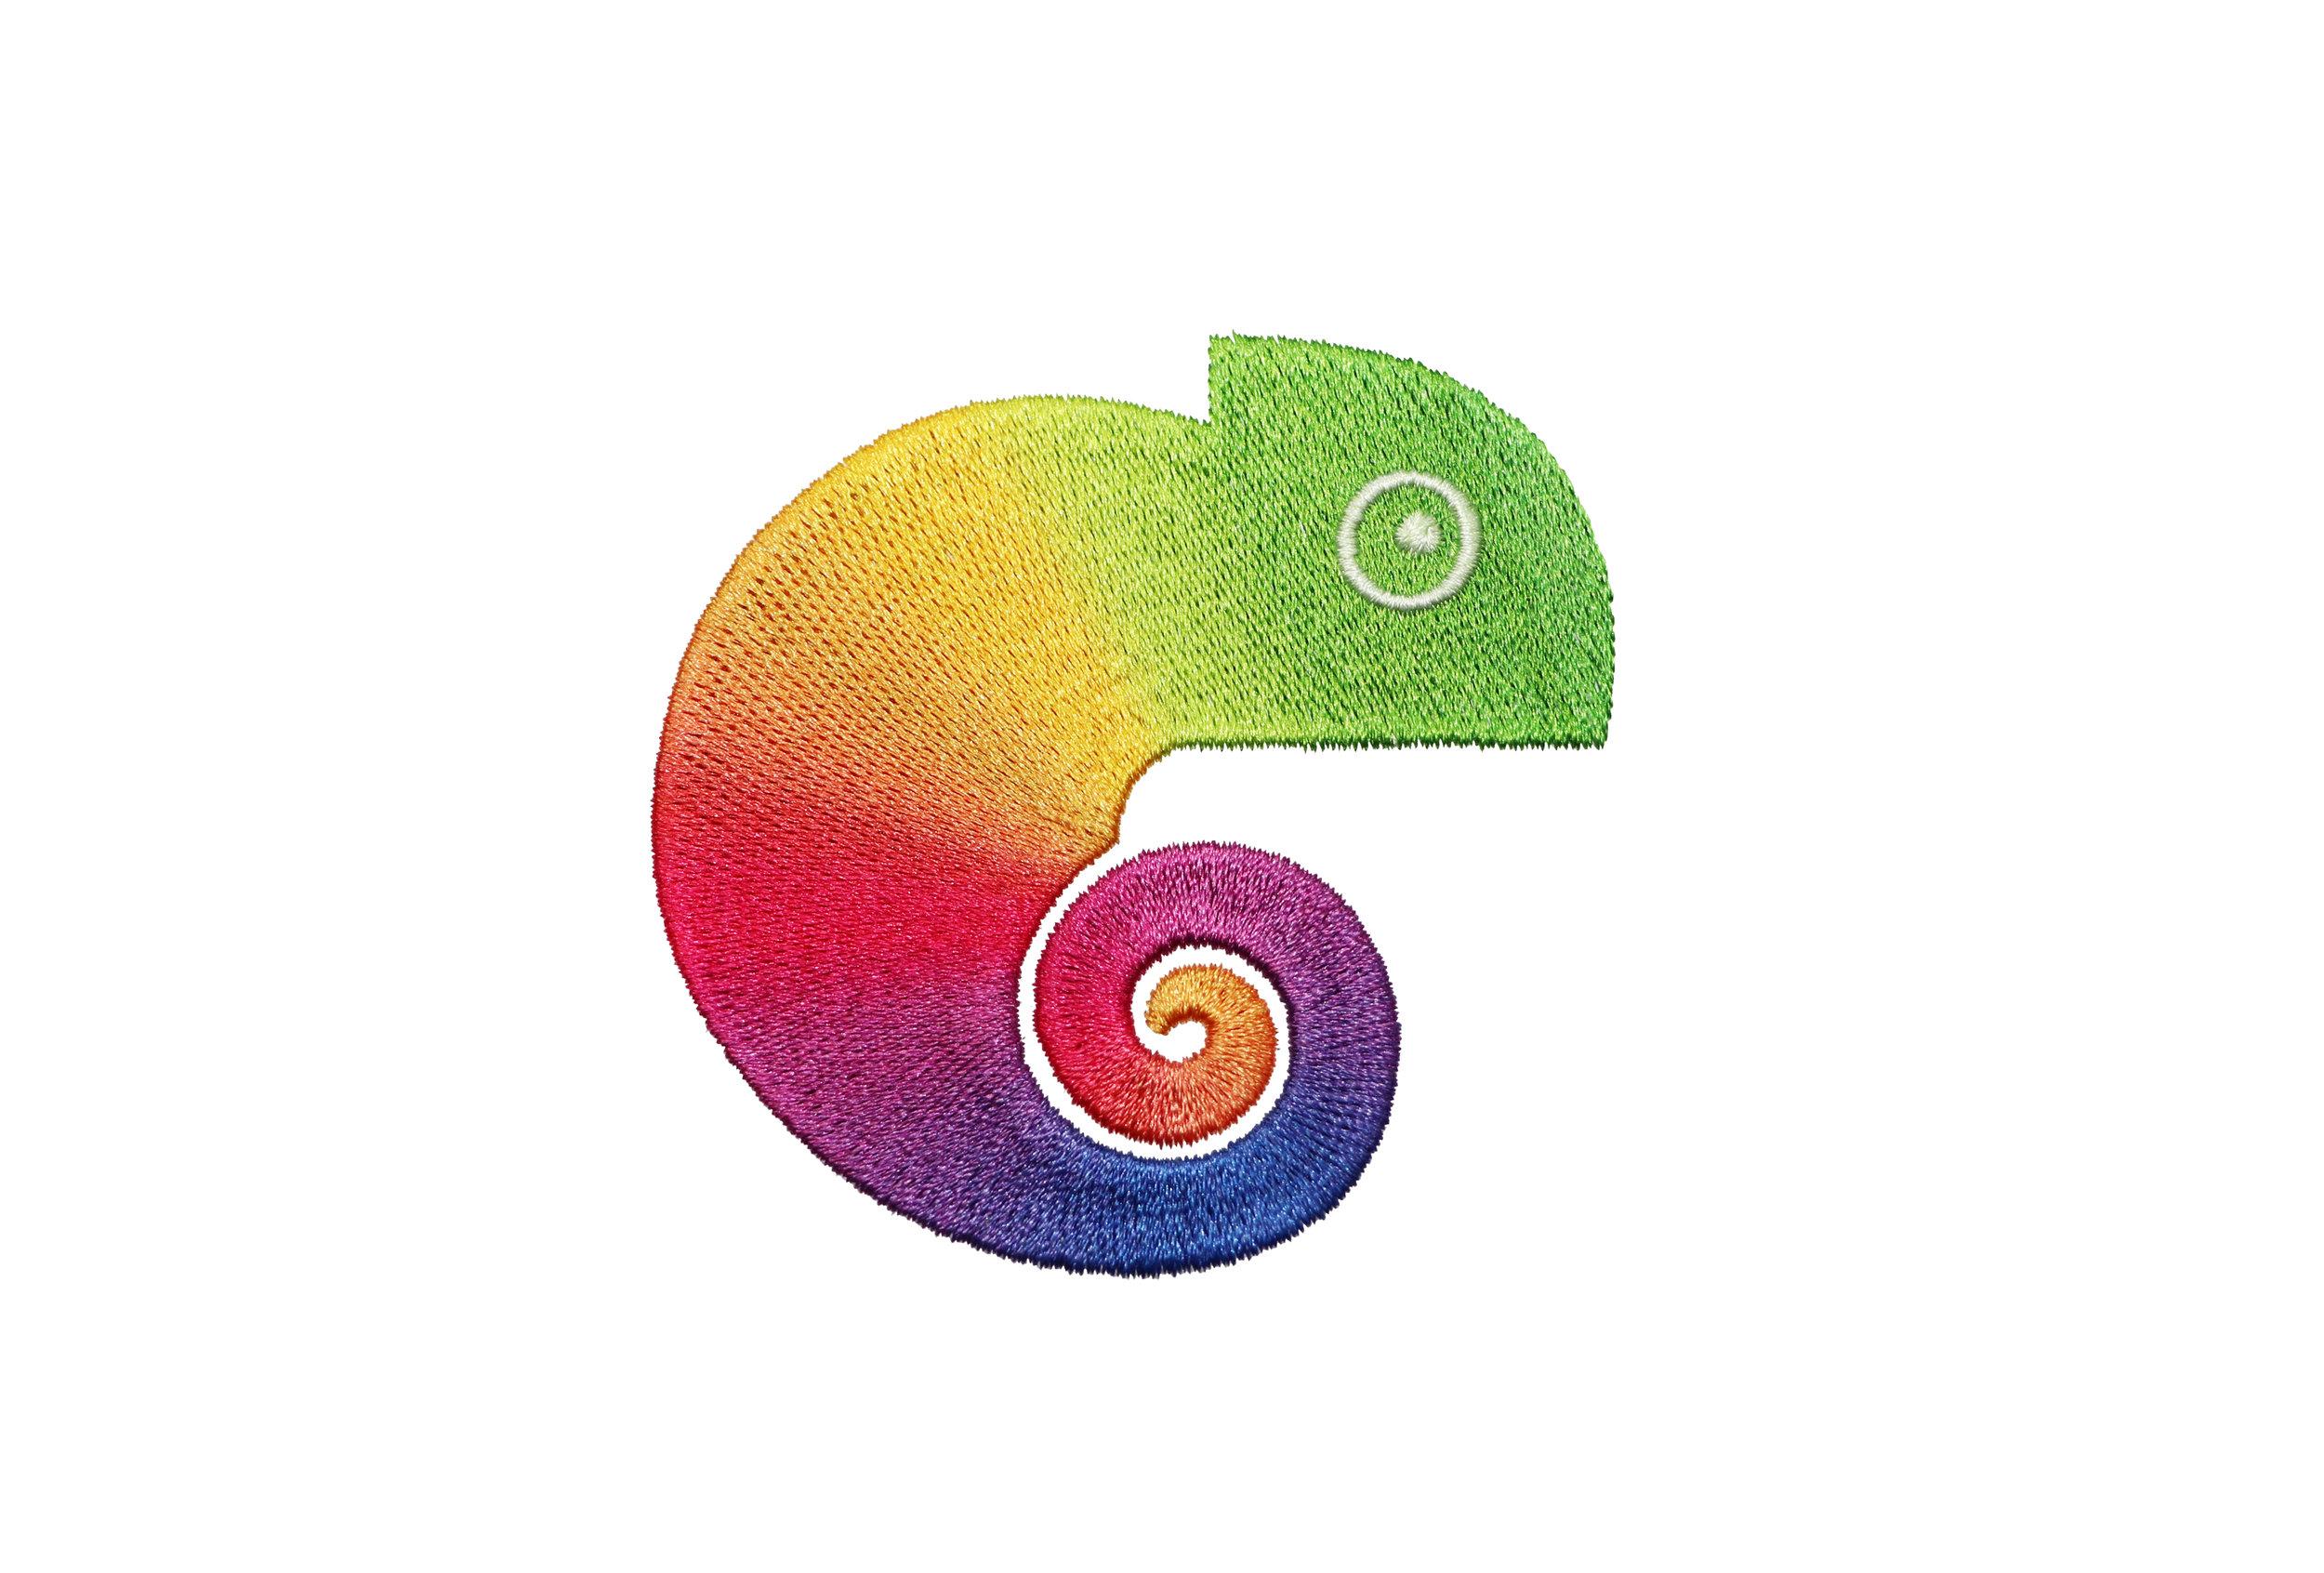 Chameleon Embroidery_large (1).jpg